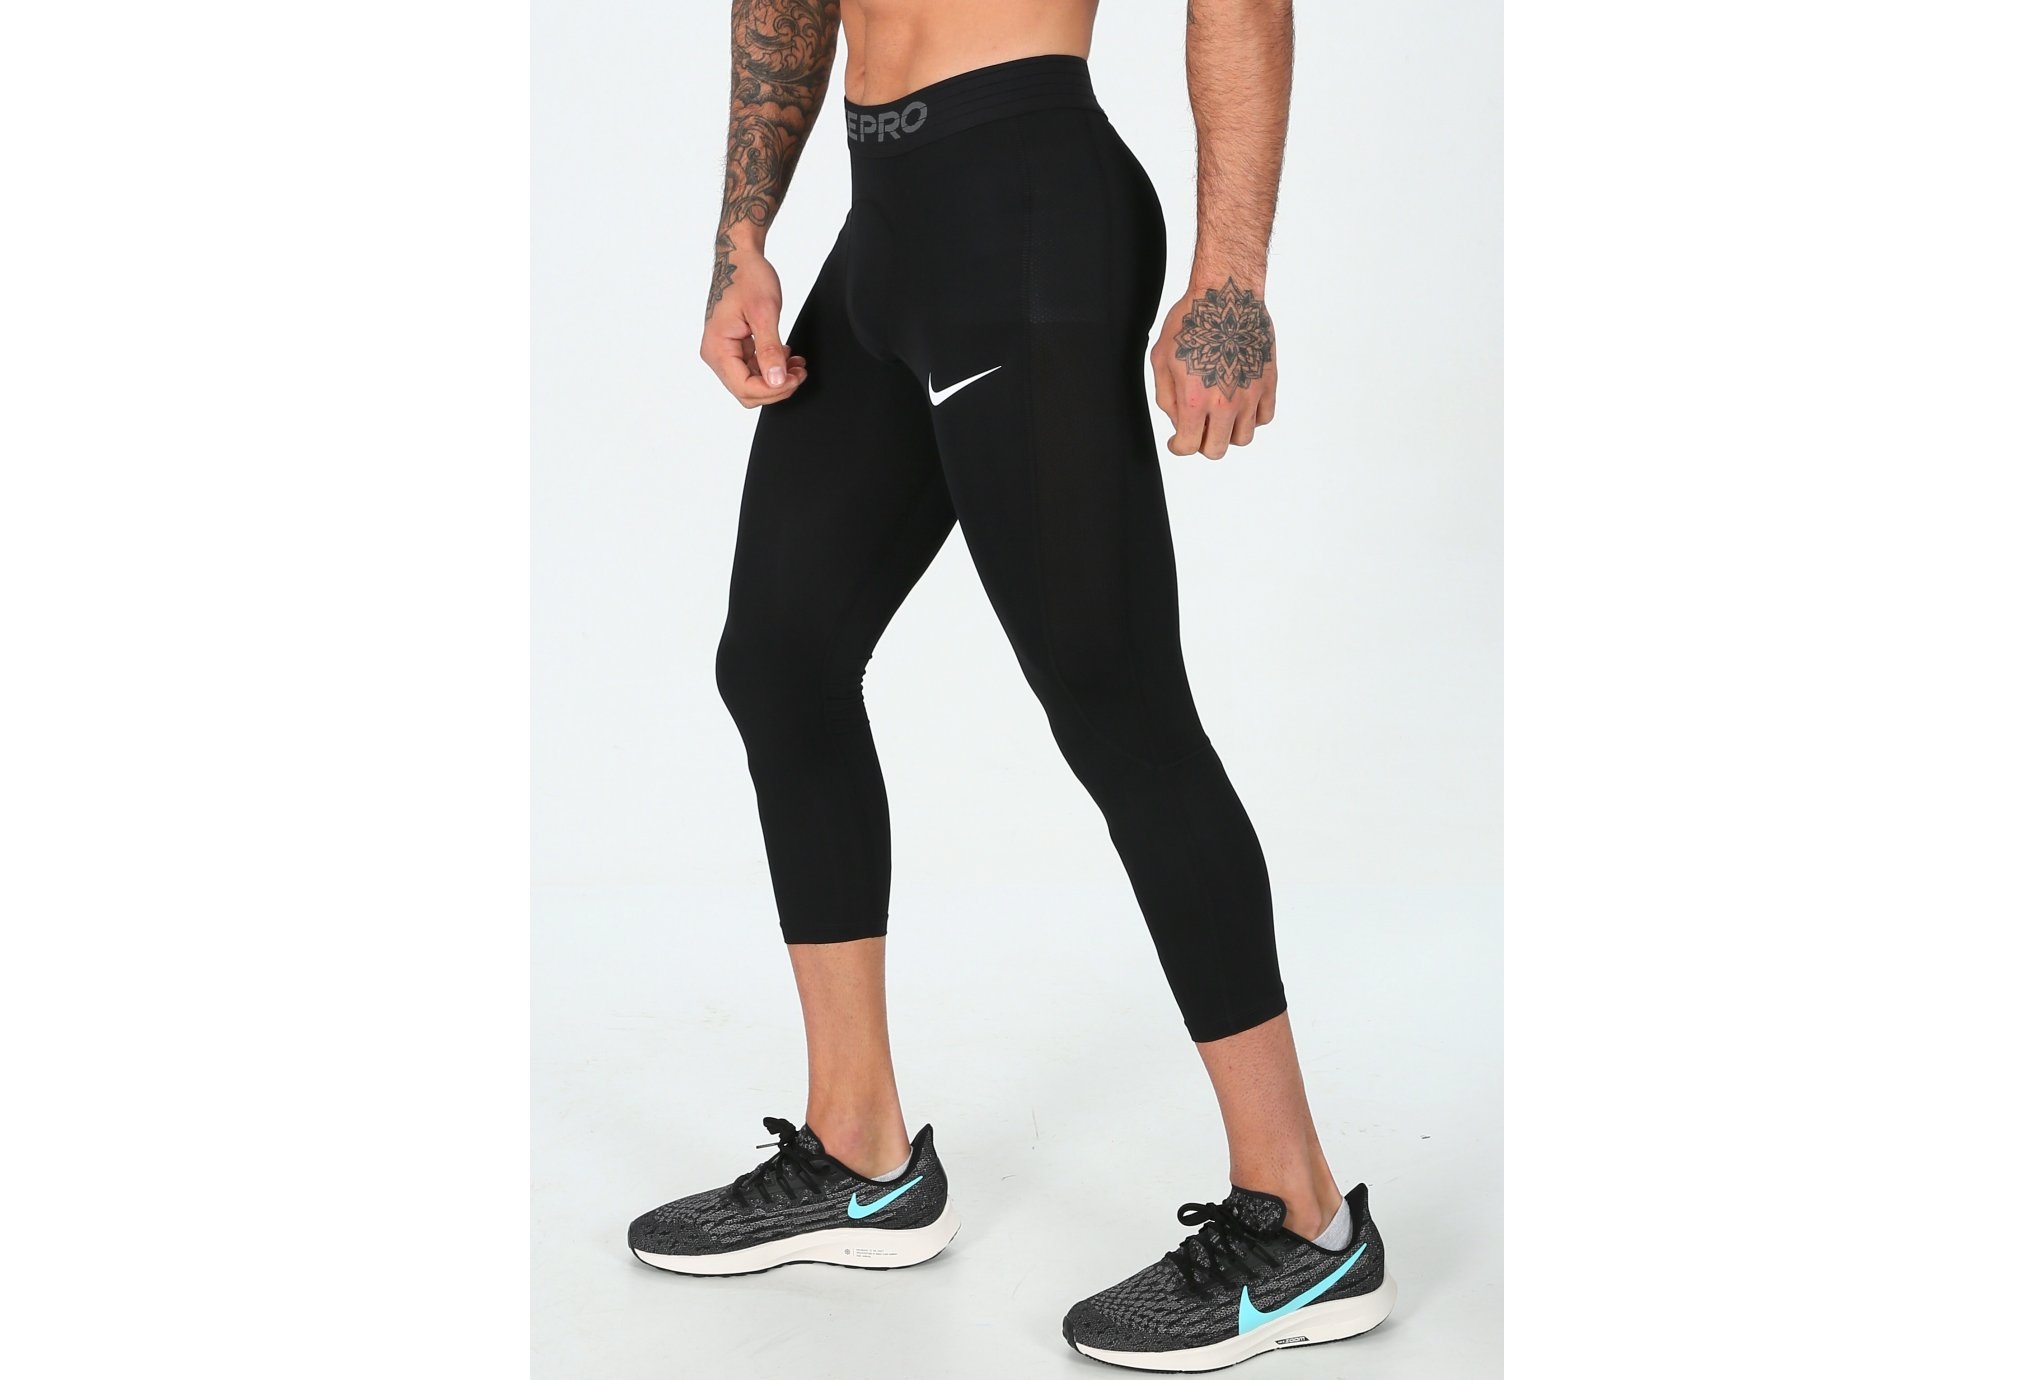 Nike Pro 3/4 M vêtement running homme